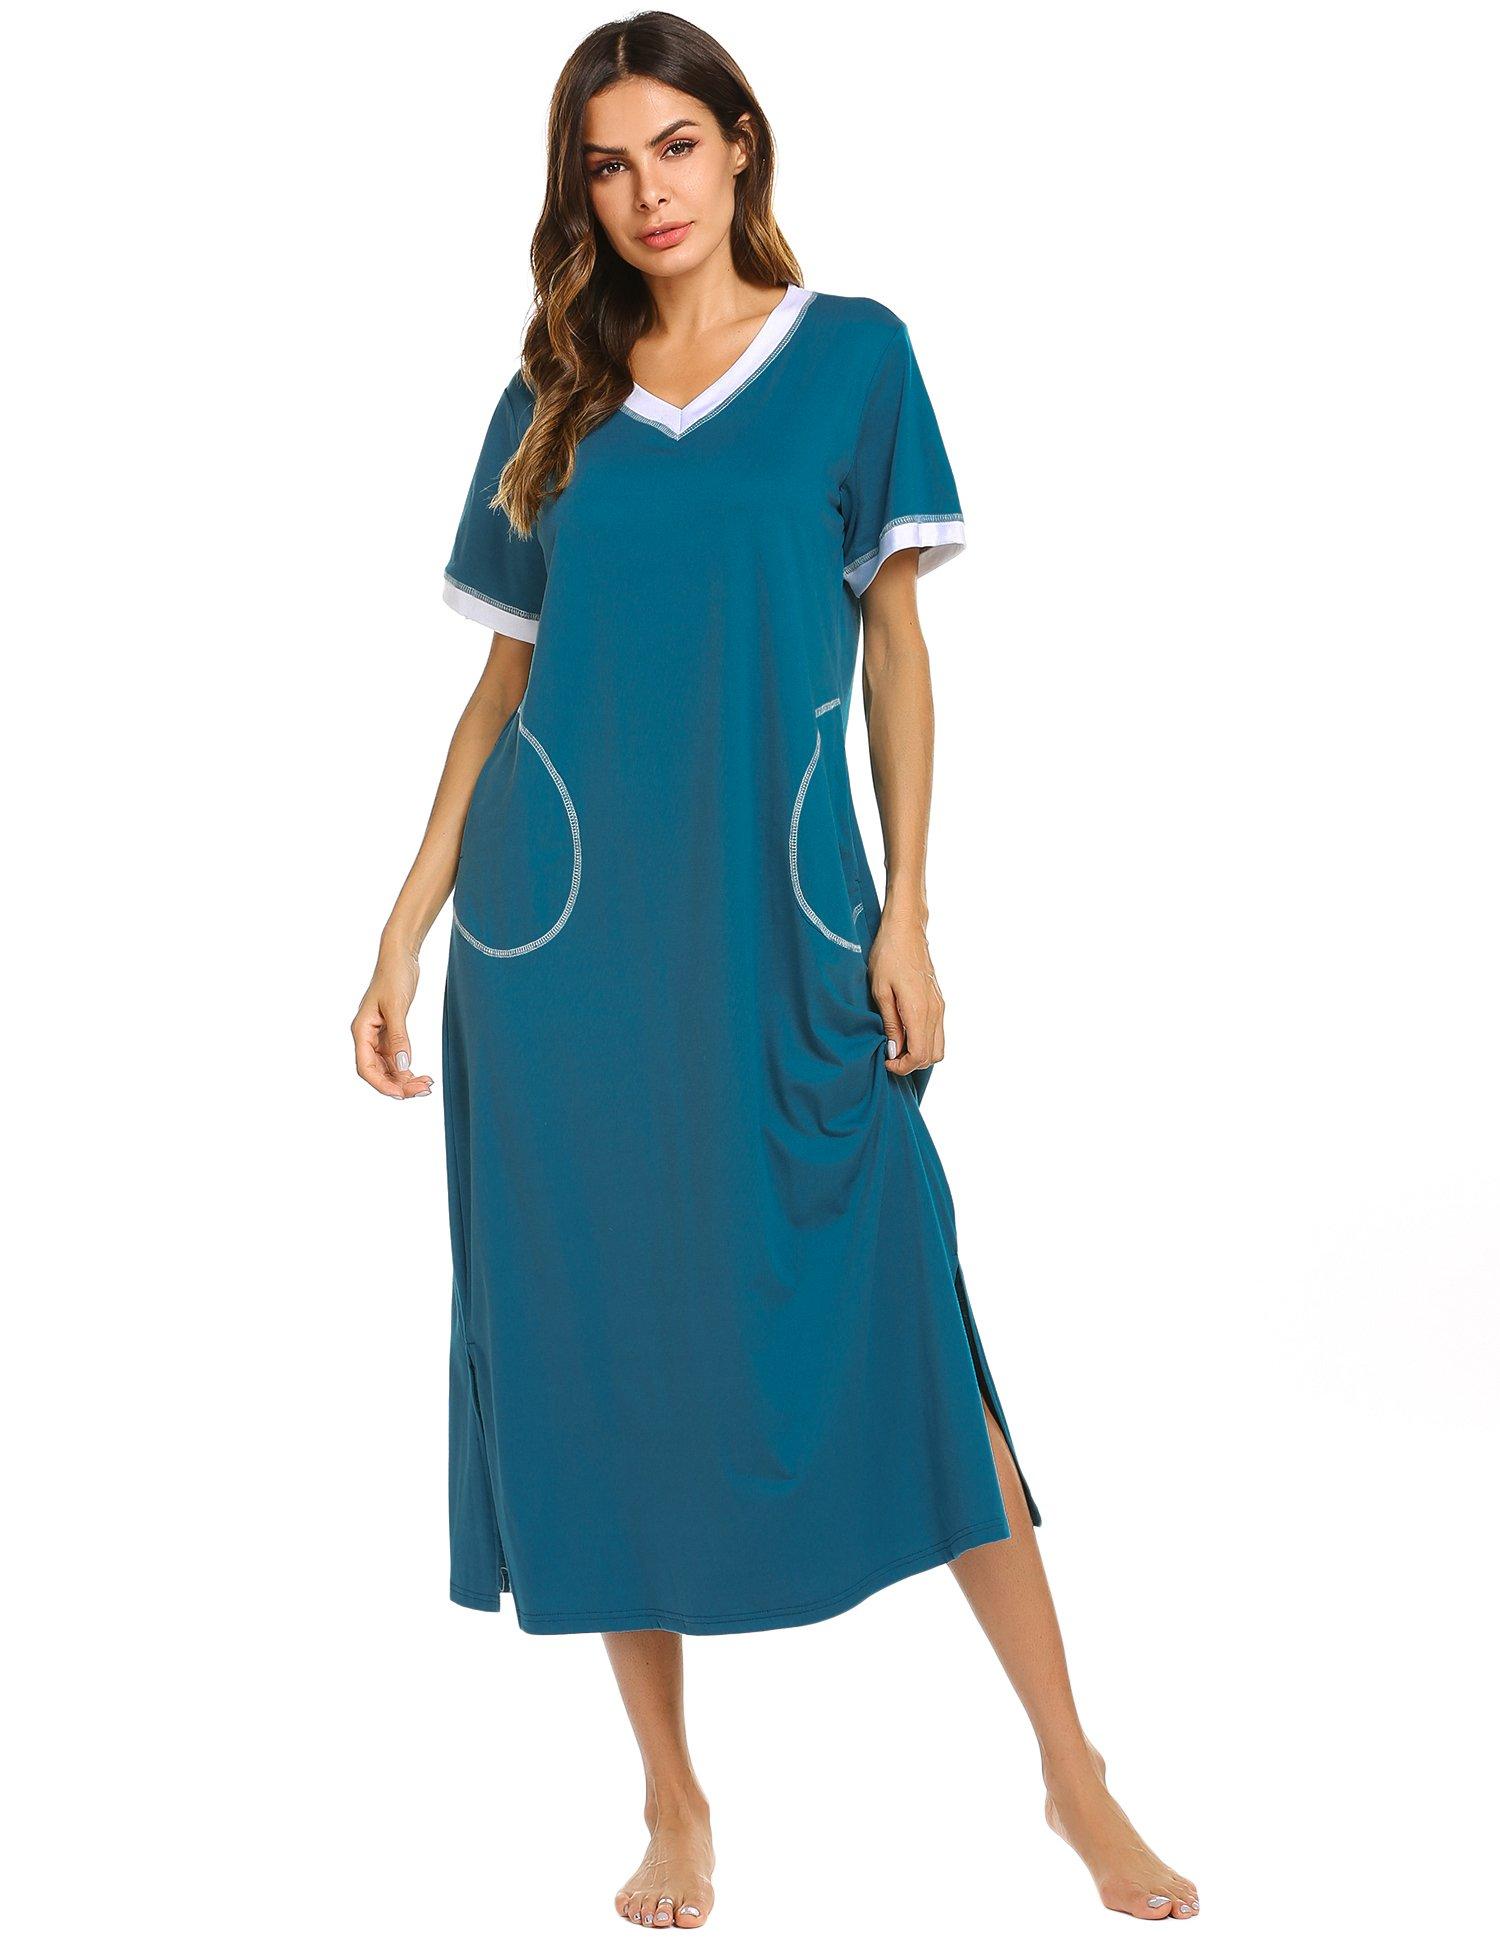 938e7f04a0 Galleon ekouaer plus size nightgown comfy sleepwear lounge dress peacock  blue small jpg 1500x1950 Comfy pjs